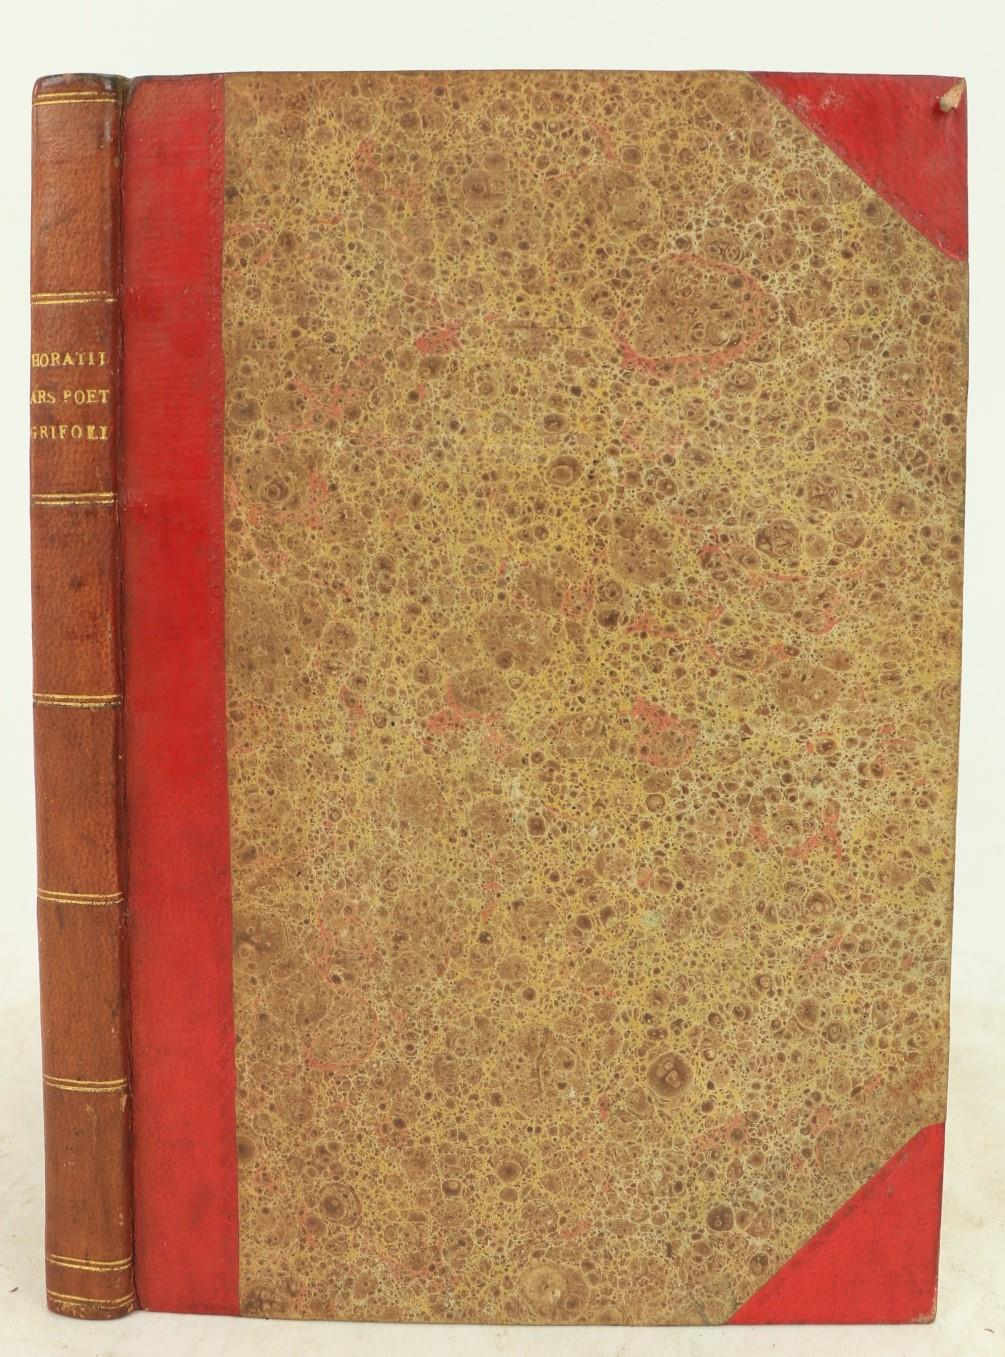 Horace -ÿÿQ Horatii Flacci Liber de Arte poetica Jacobi GTrifoli Lucinianesis interpretatione